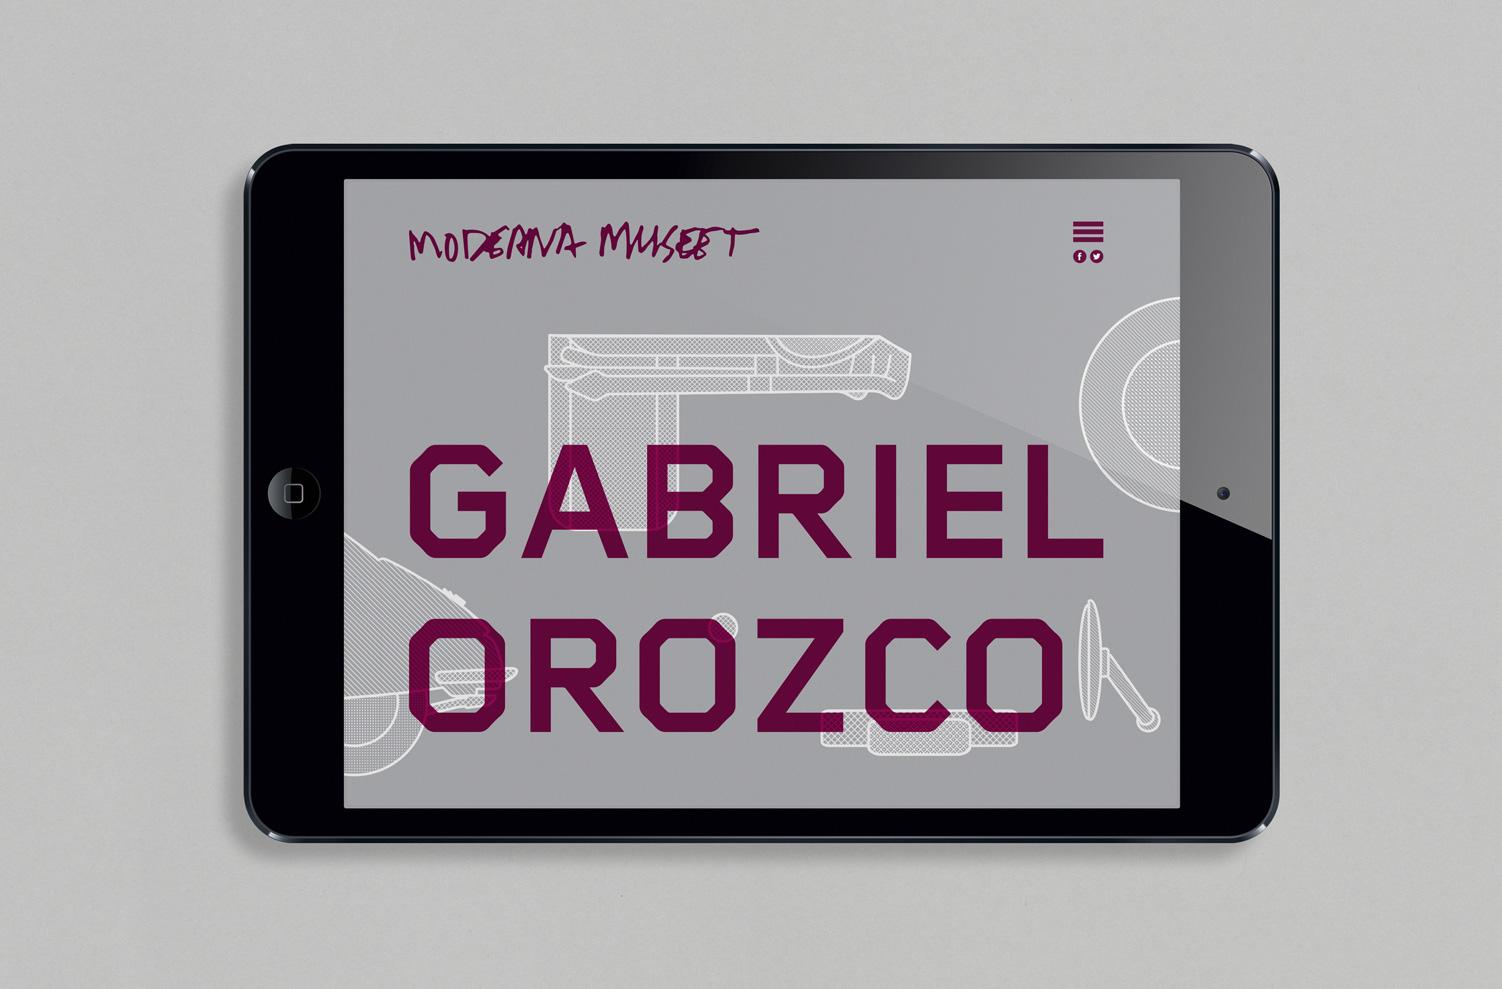 moderna_museet_orozco3